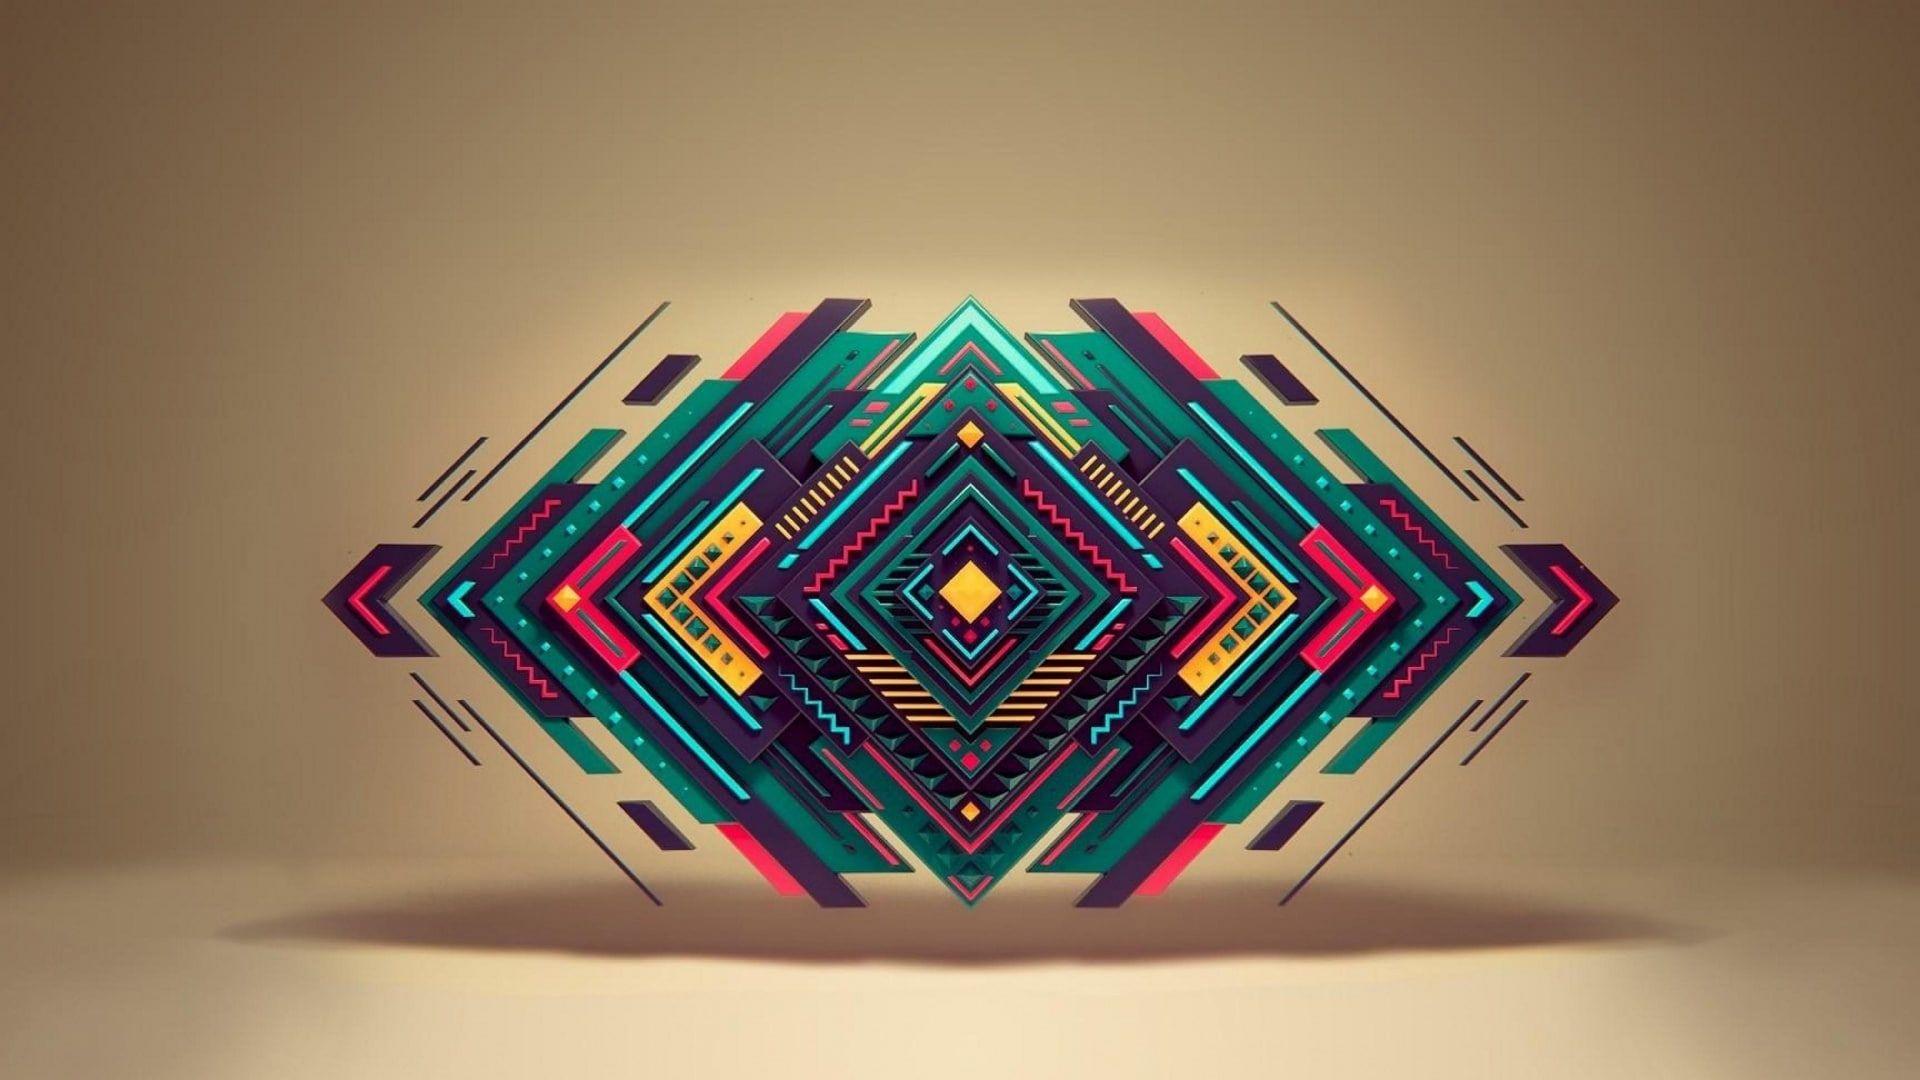 Design Line Graphic Design Graphics Symmetry Pattern 1080p Wallpaper Hdwallpaper Desktop Abstract Wallpaper Abstract Widescreen Wallpaper